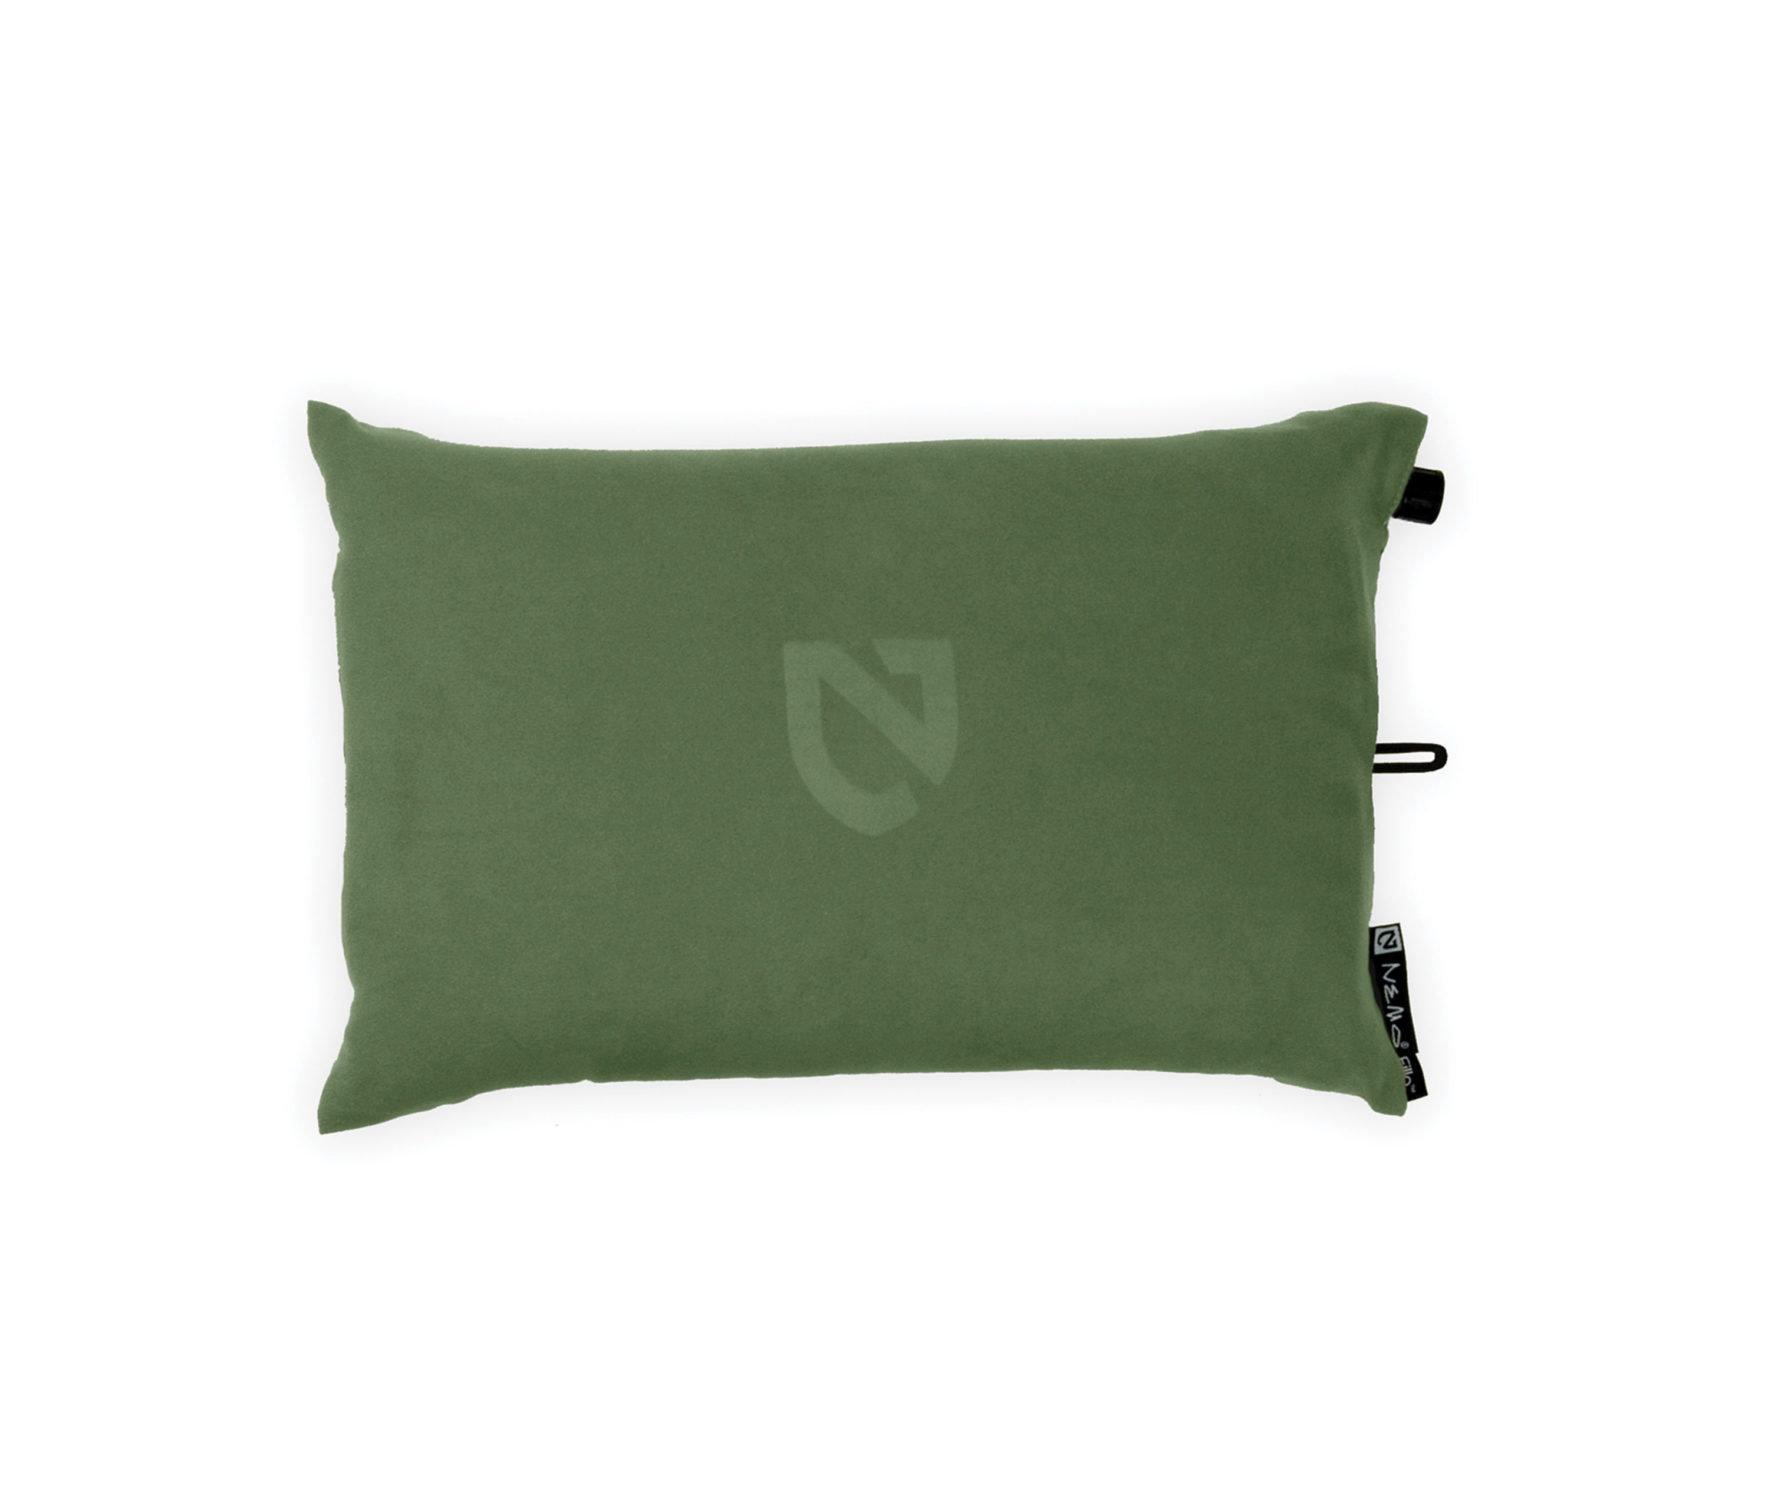 NEMO Fillo Backpacking & Camping Pillow JRI1NEMOFILLO